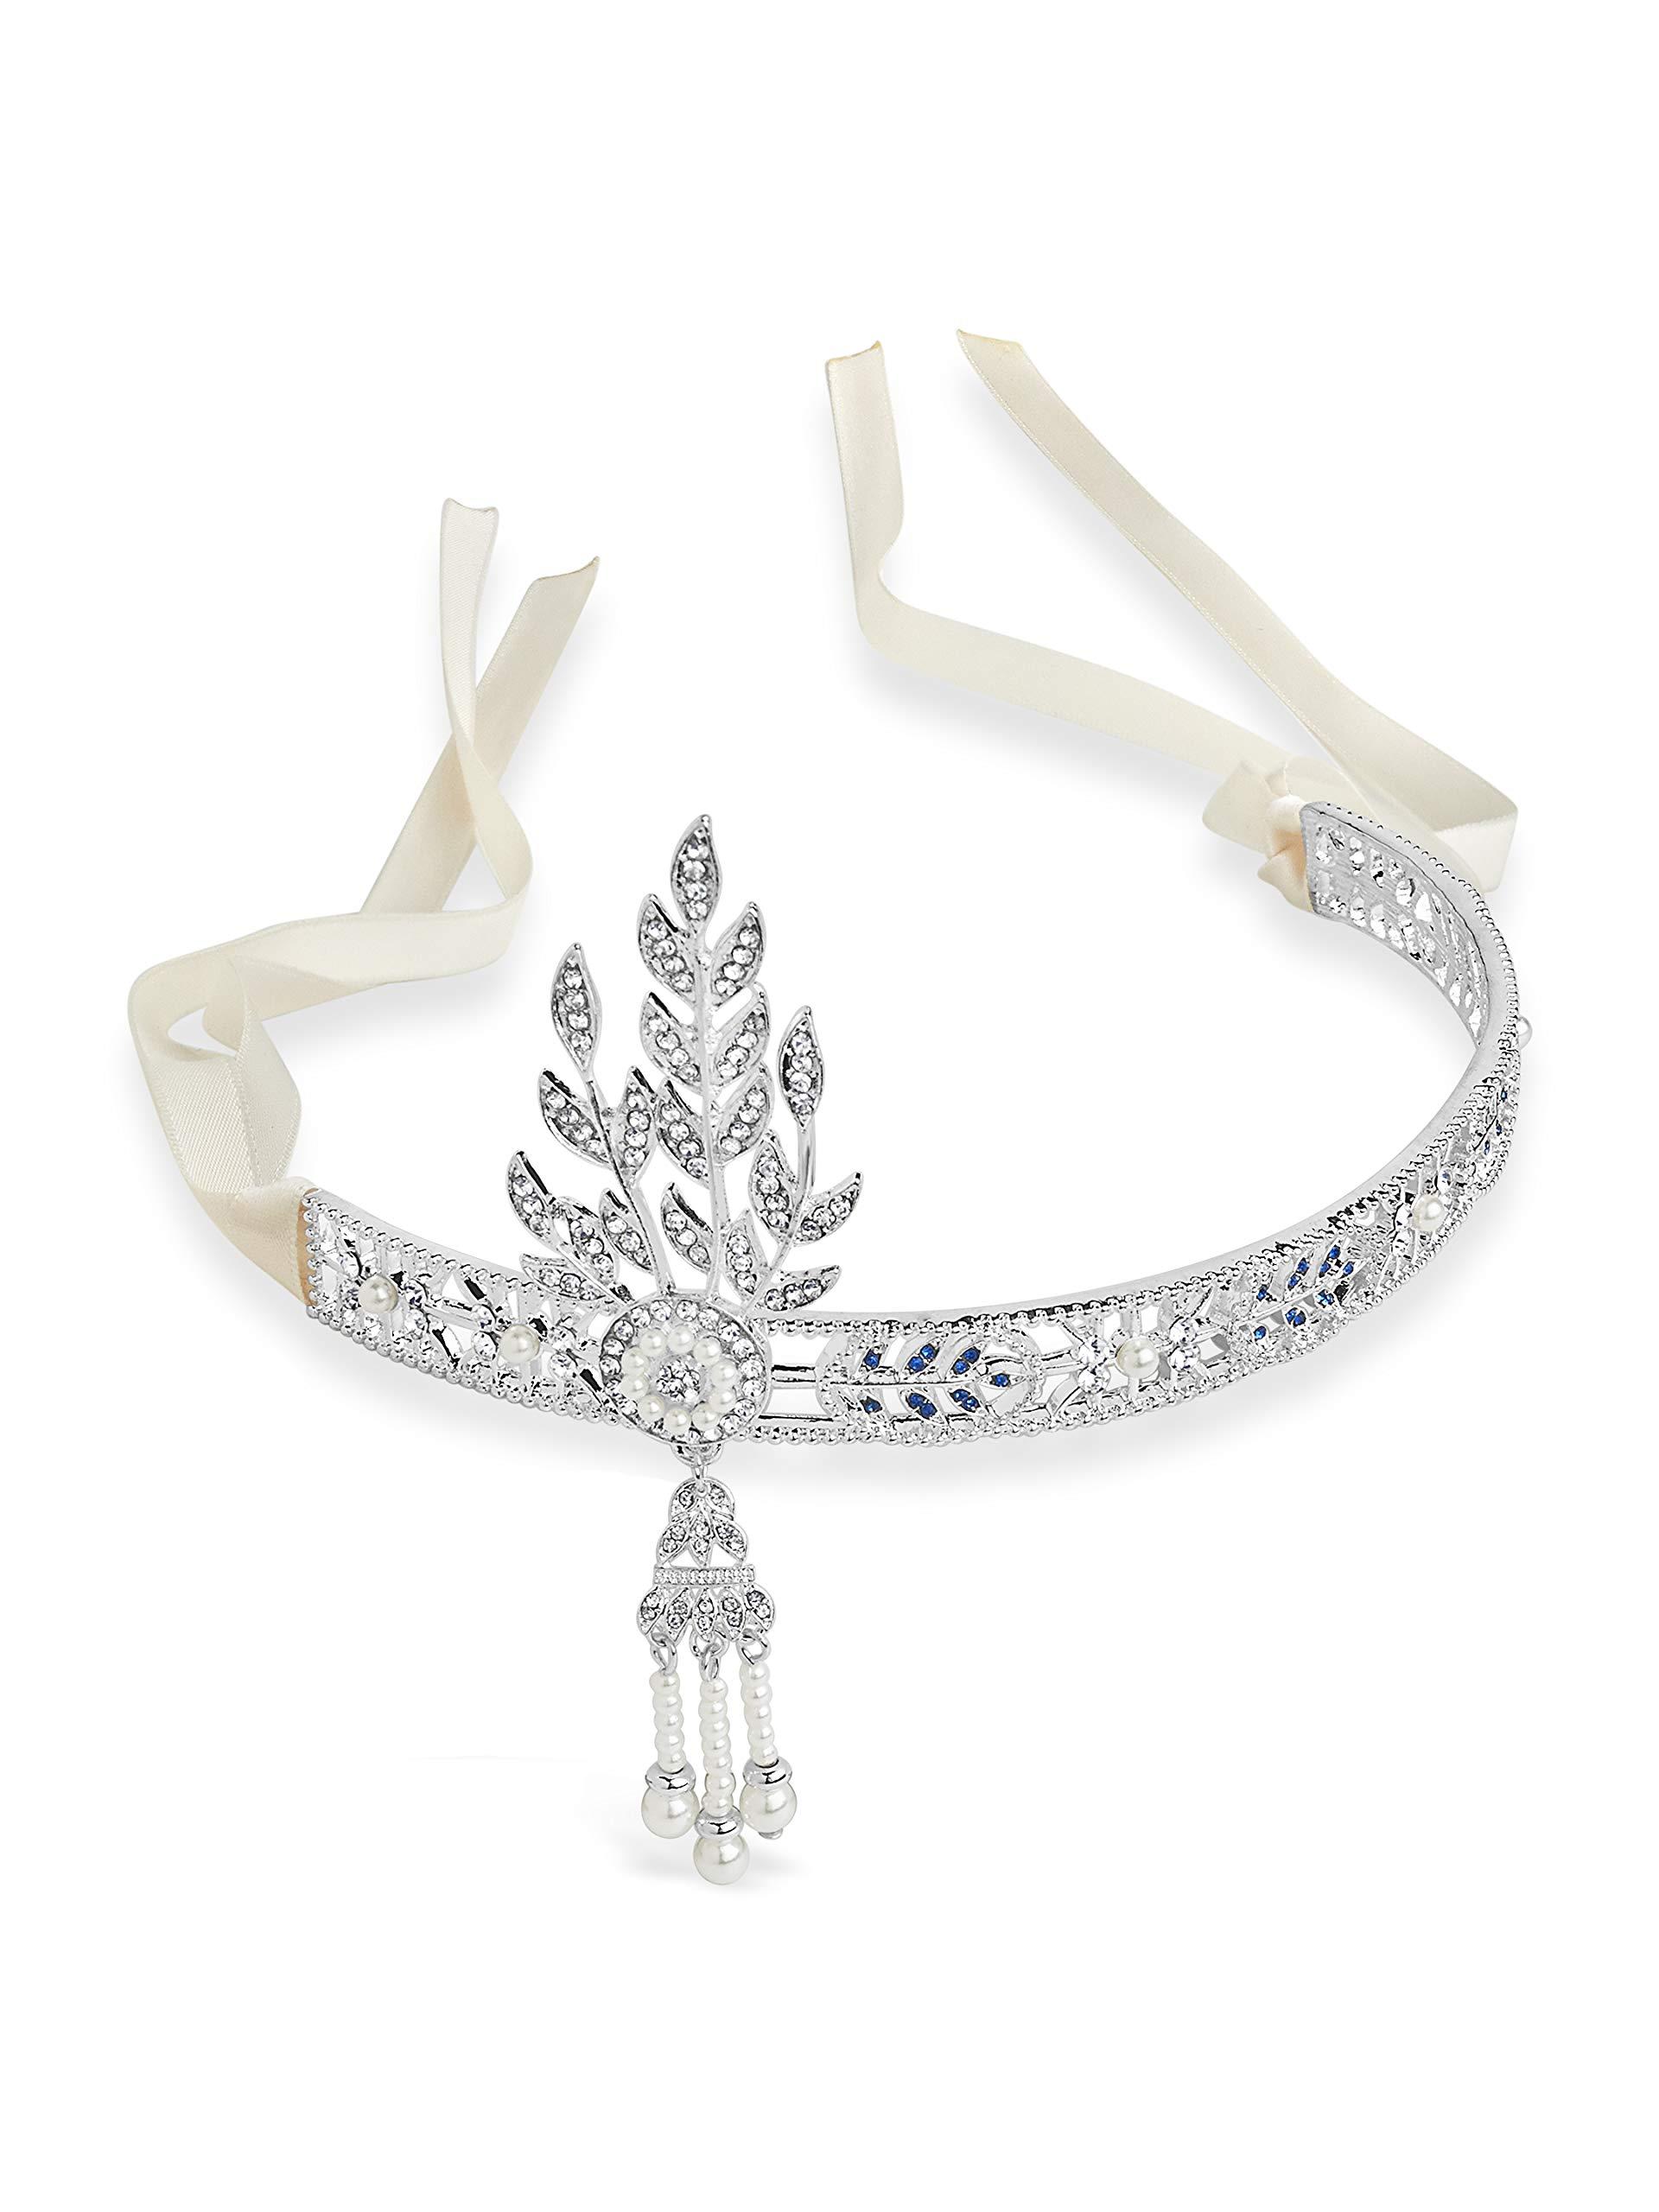 Sterling Forever - Gatsby Inspired Art Deco Wedding Tiara Headpiece (Cream)